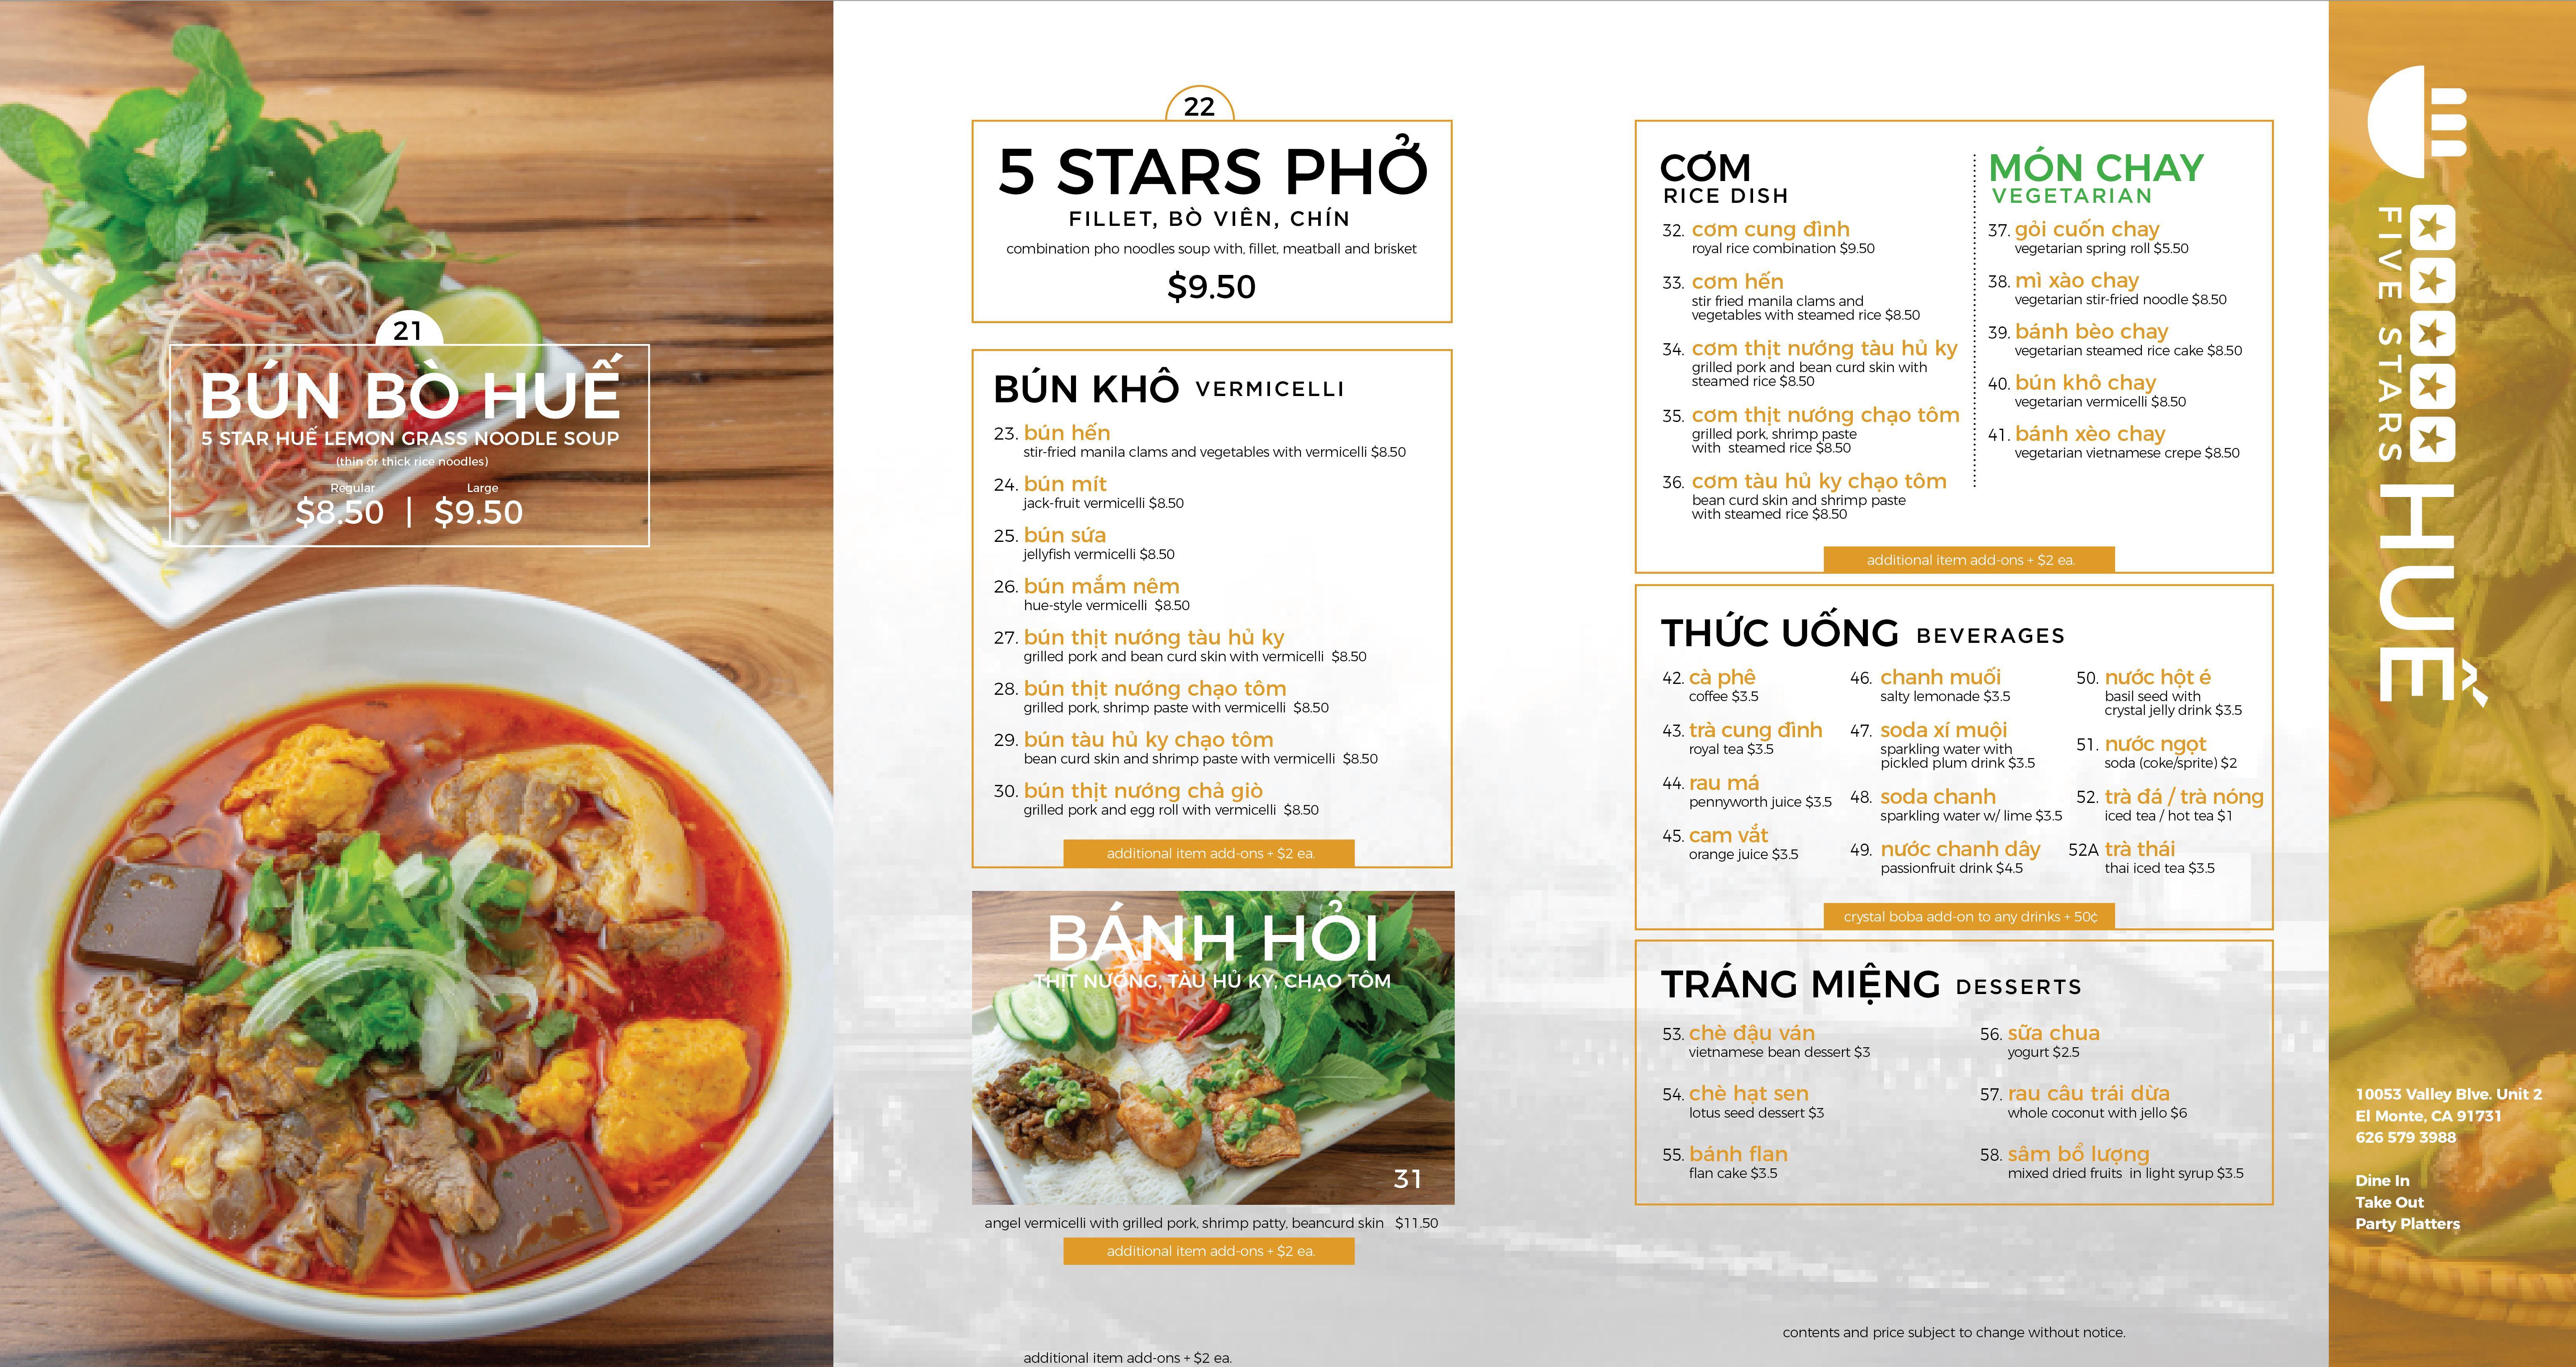 menu-1 #5StarsHue in #ELMonte & #Duarte 10053 Valley Blvd, El Monte CA 91731 626-579-3988 1020 Hunti 5 Stars Hue Duarte (626)531-7688